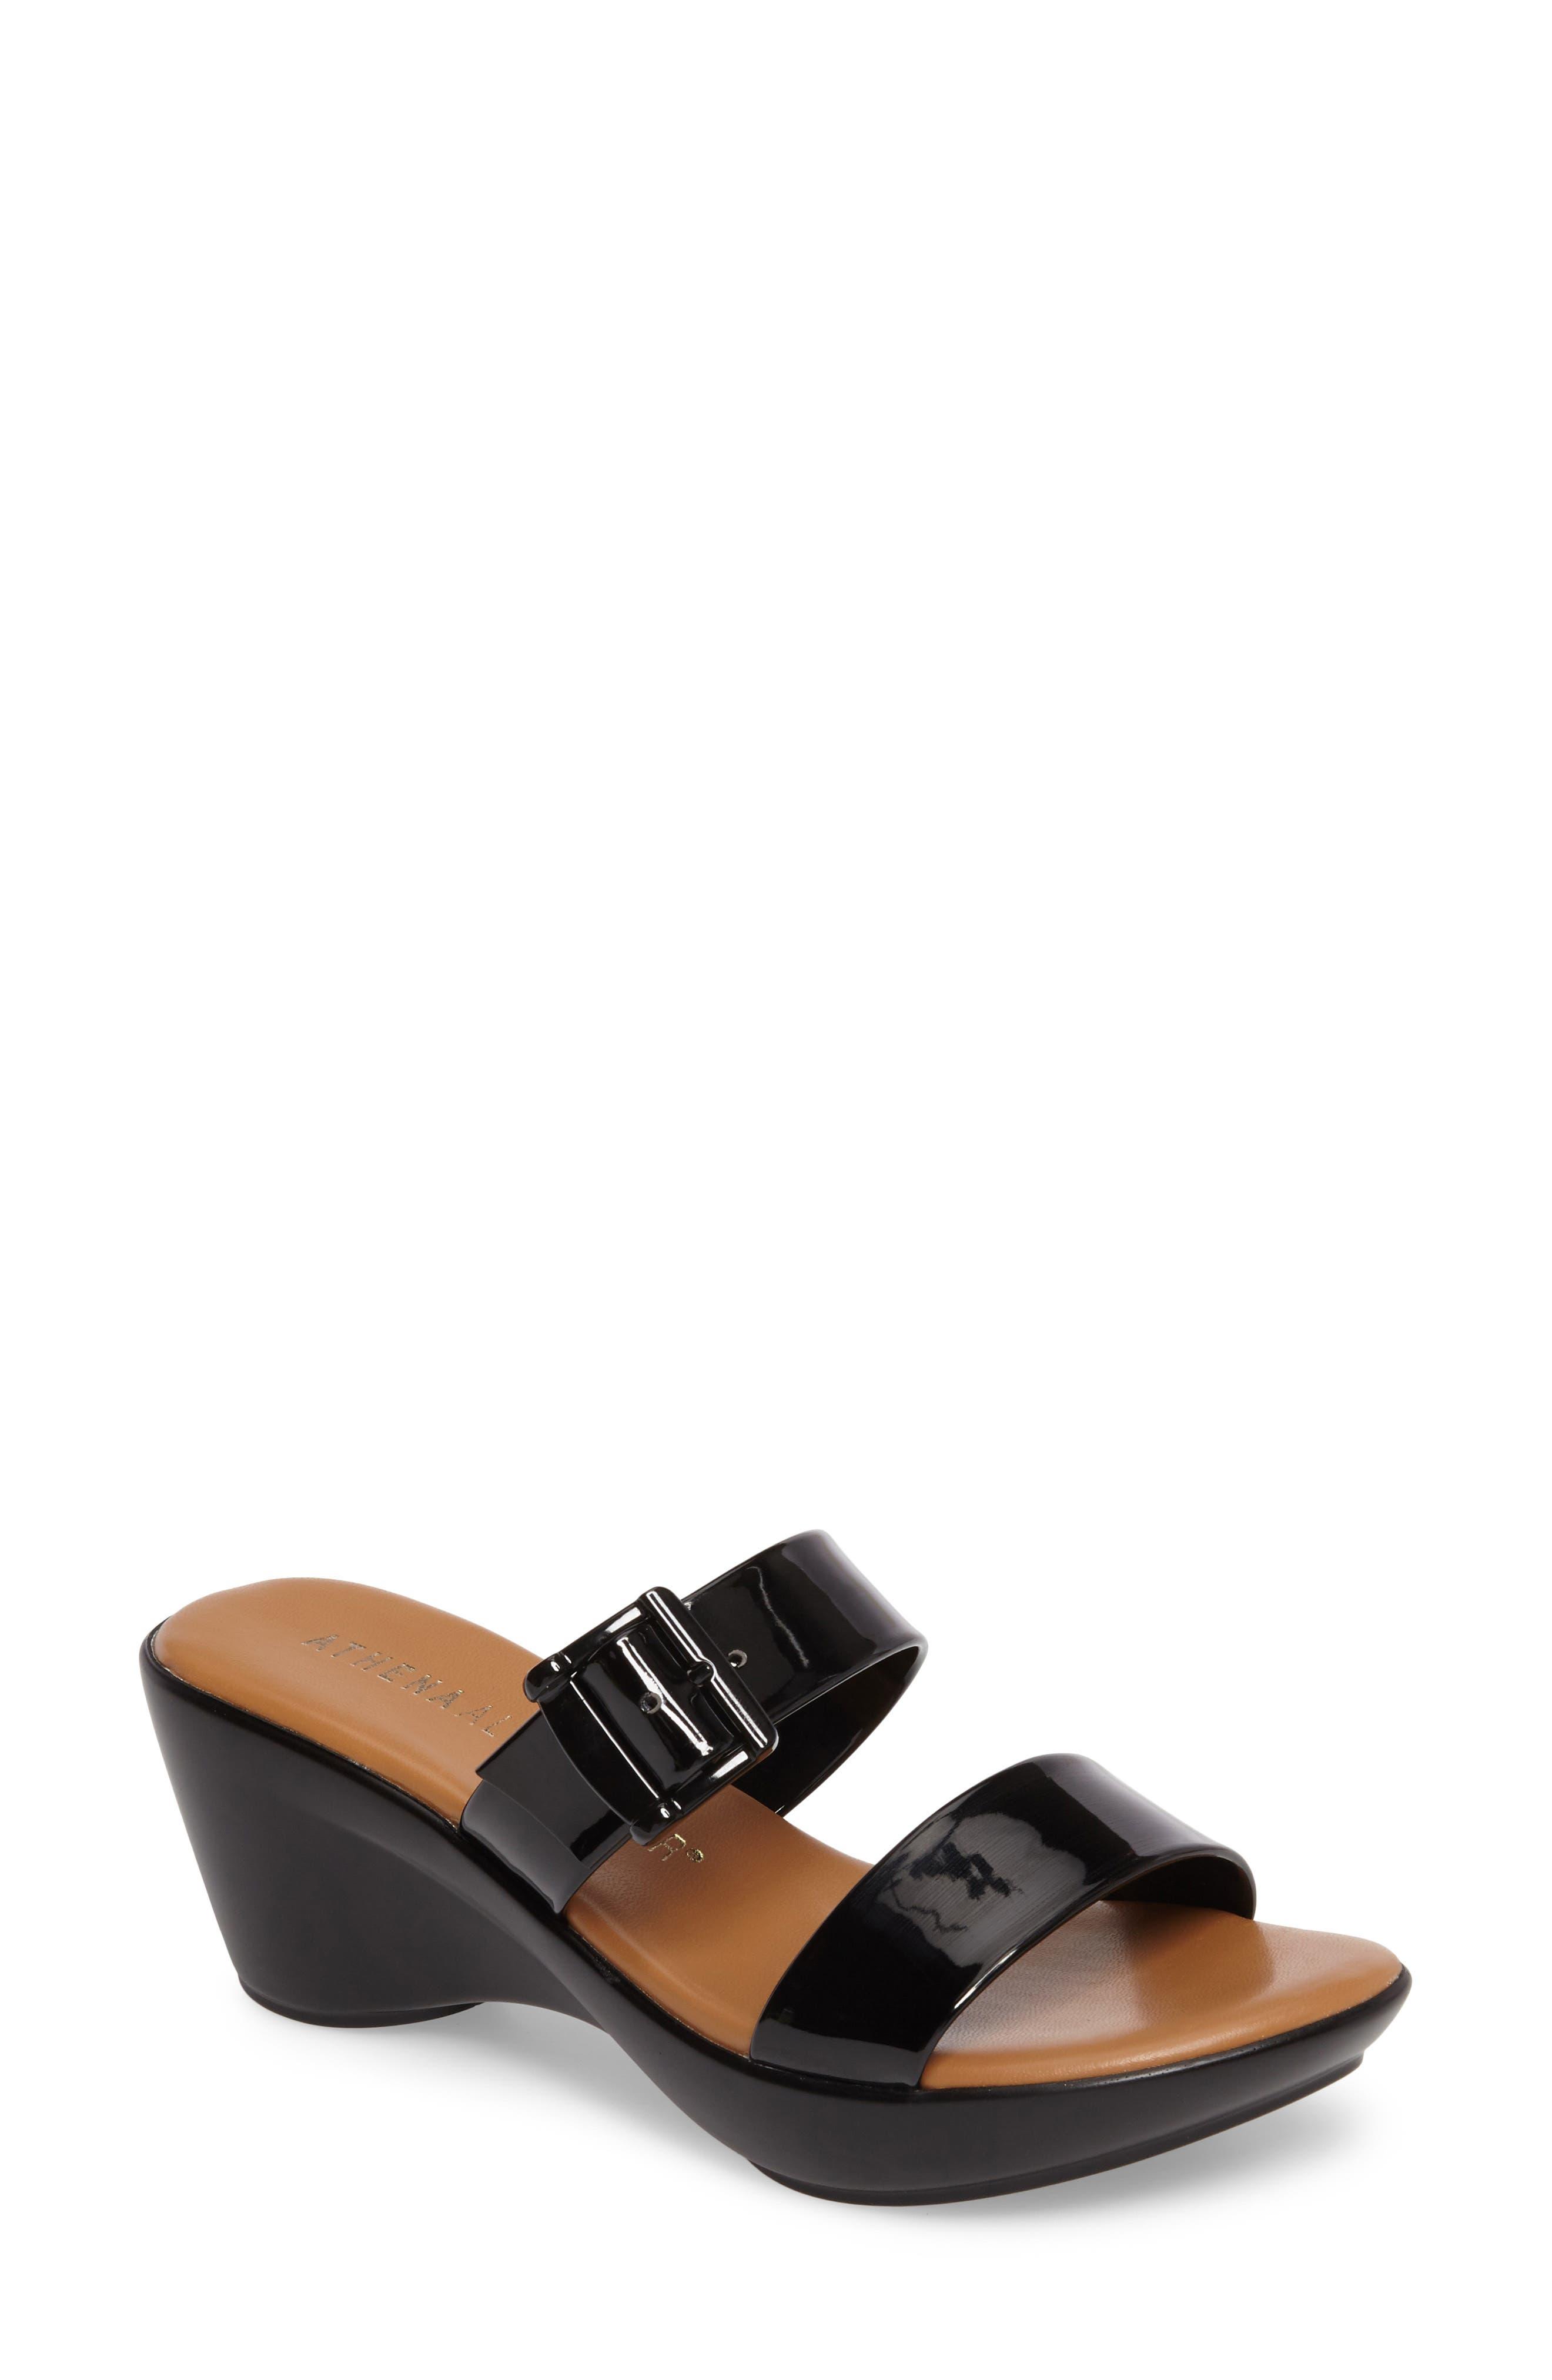 Athena Alexander Darlling Wedge Sandal, Black